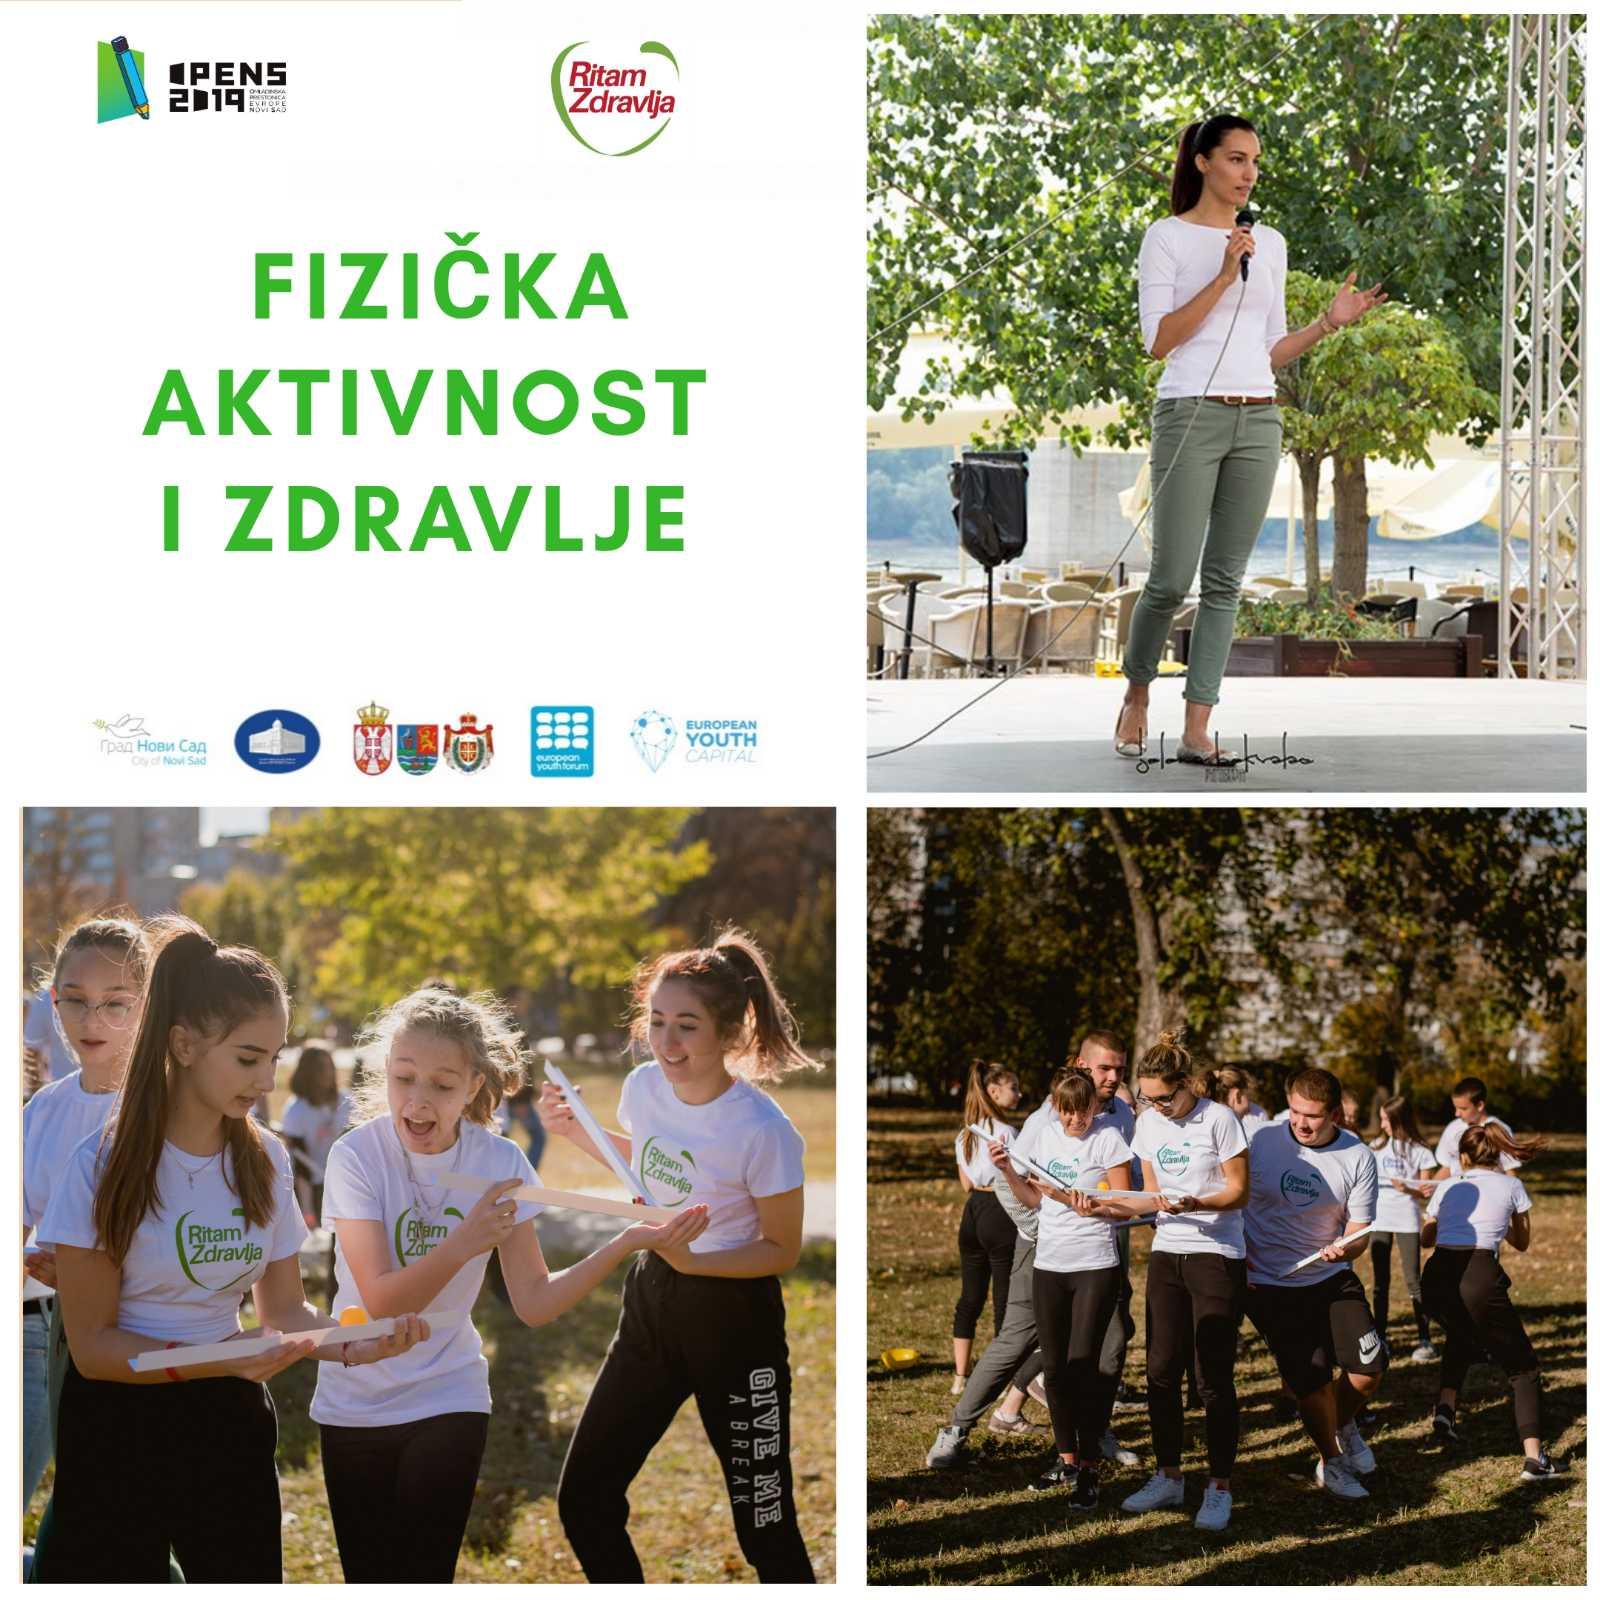 Evropska nedelja sporta u ritmu zdravlja